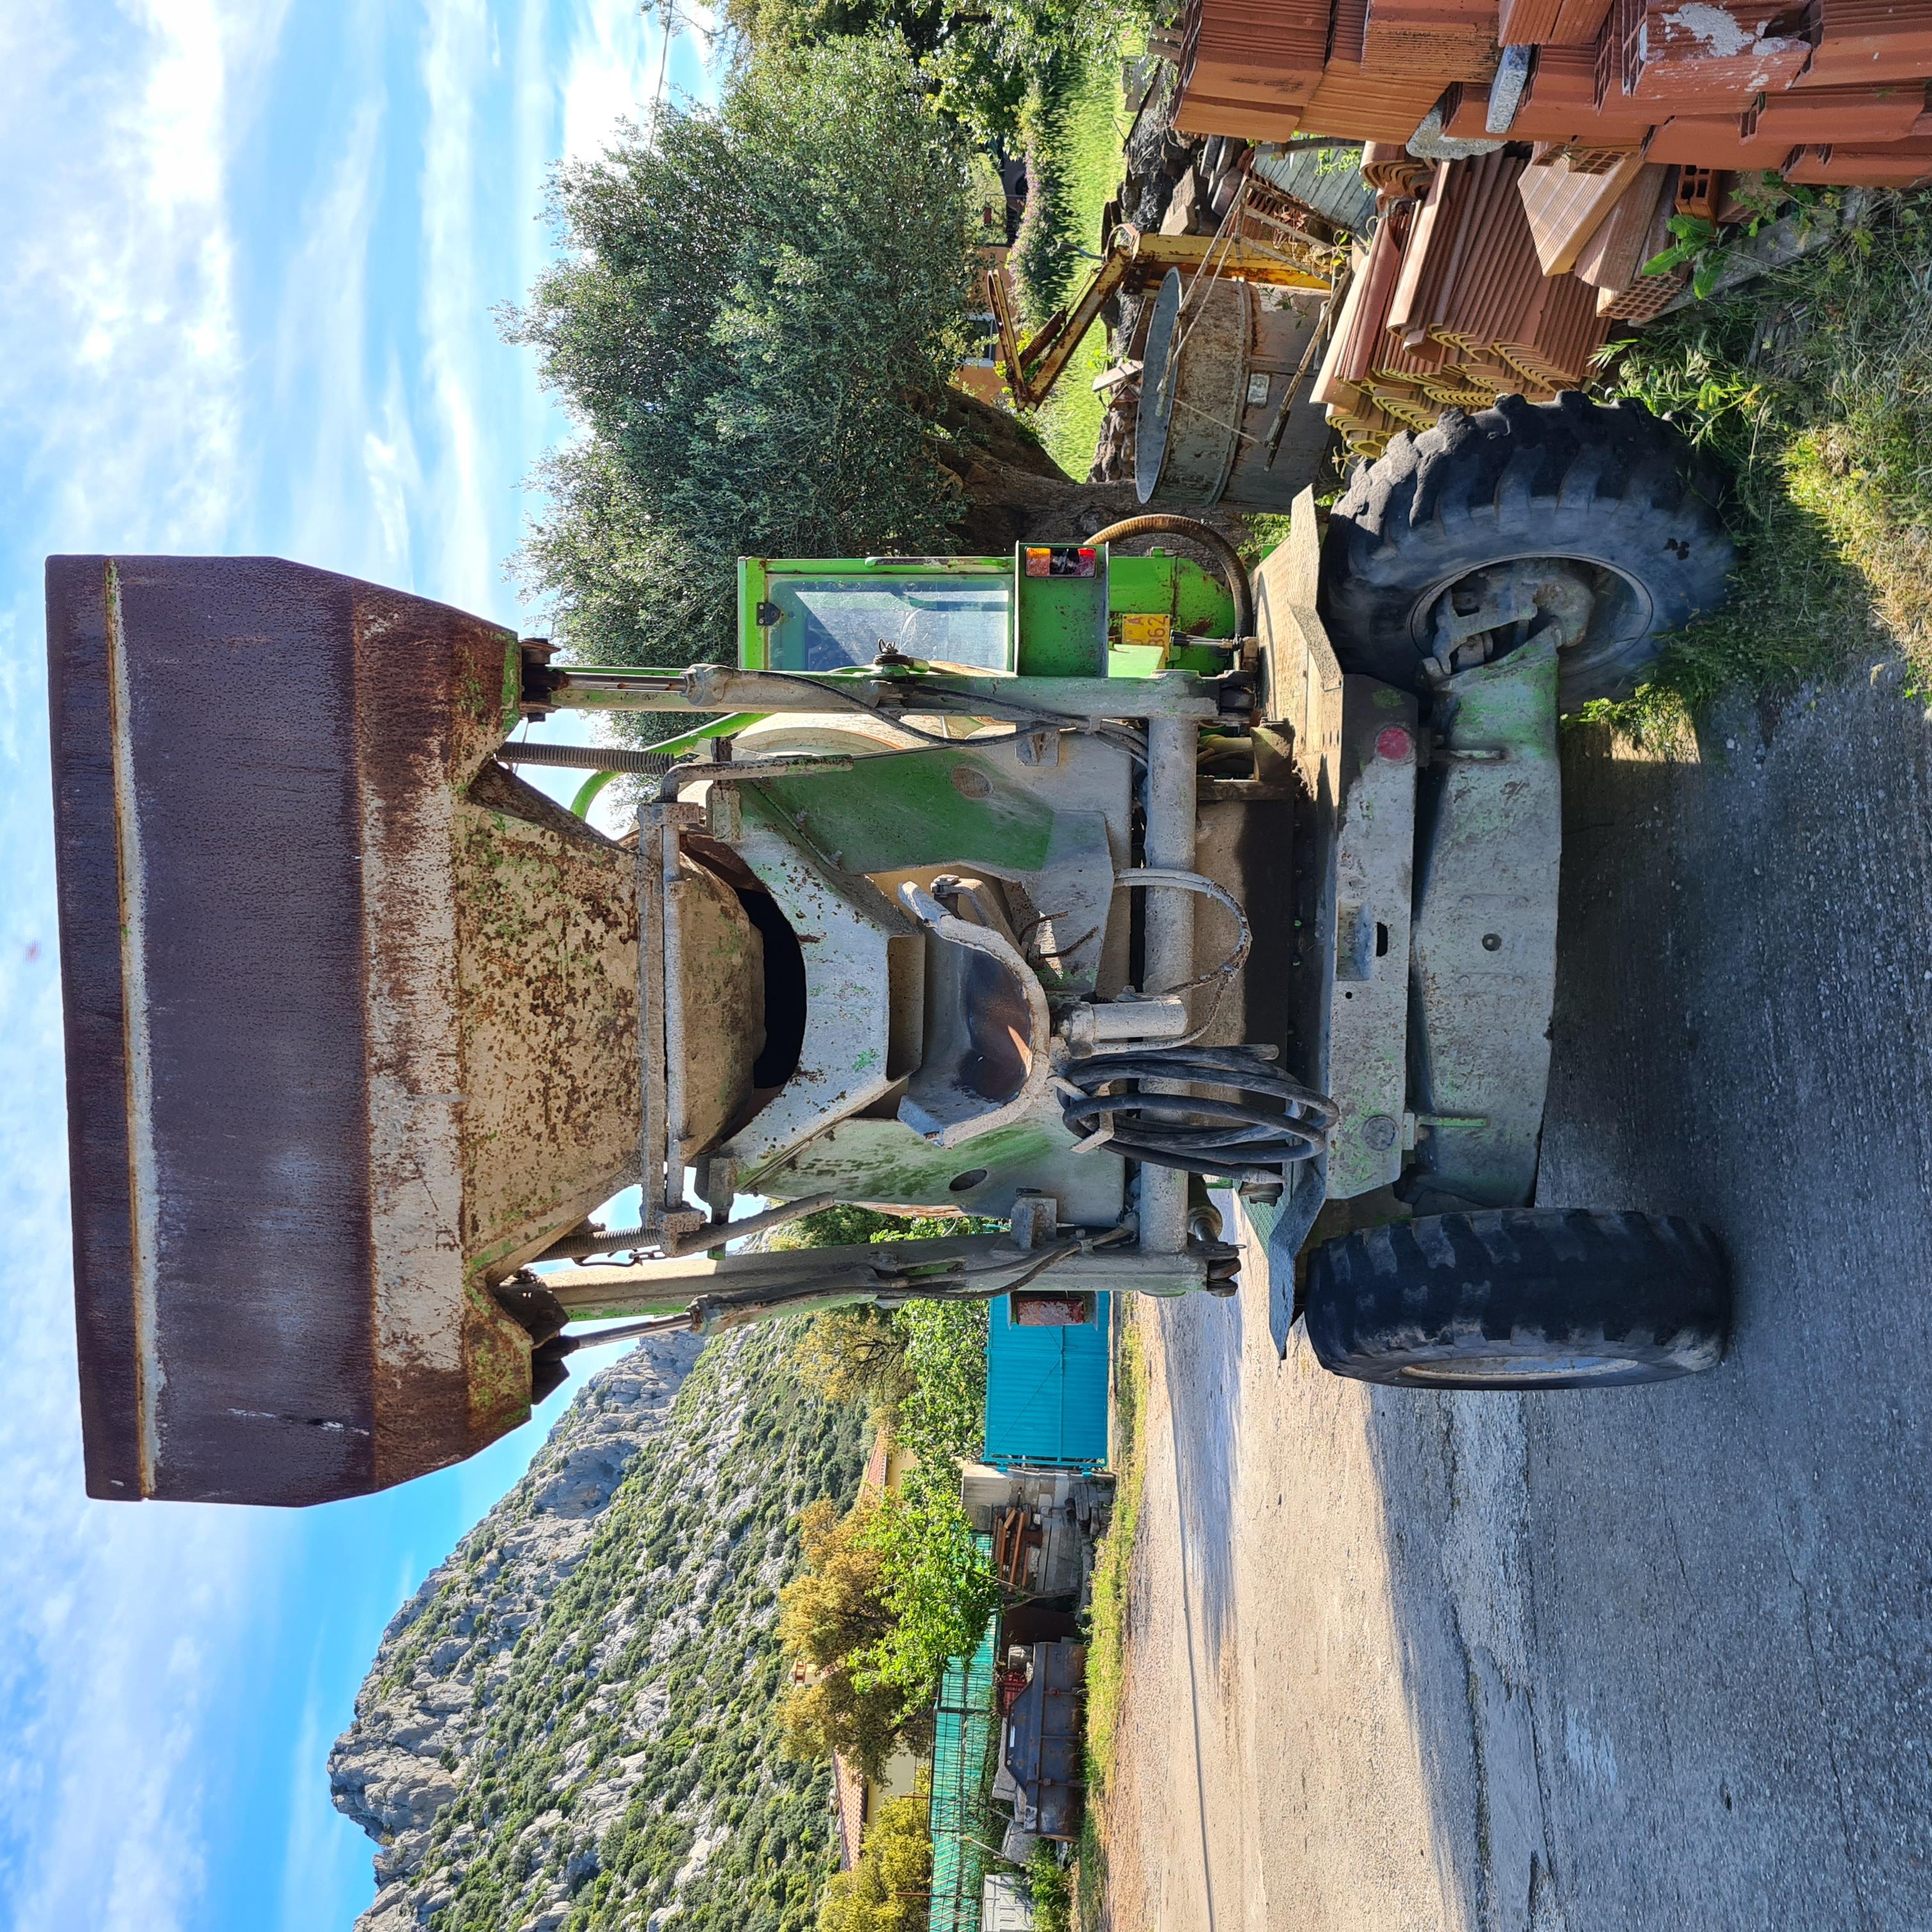 Merlo dumper betoniera dbm 2500 in vendita - foto 3